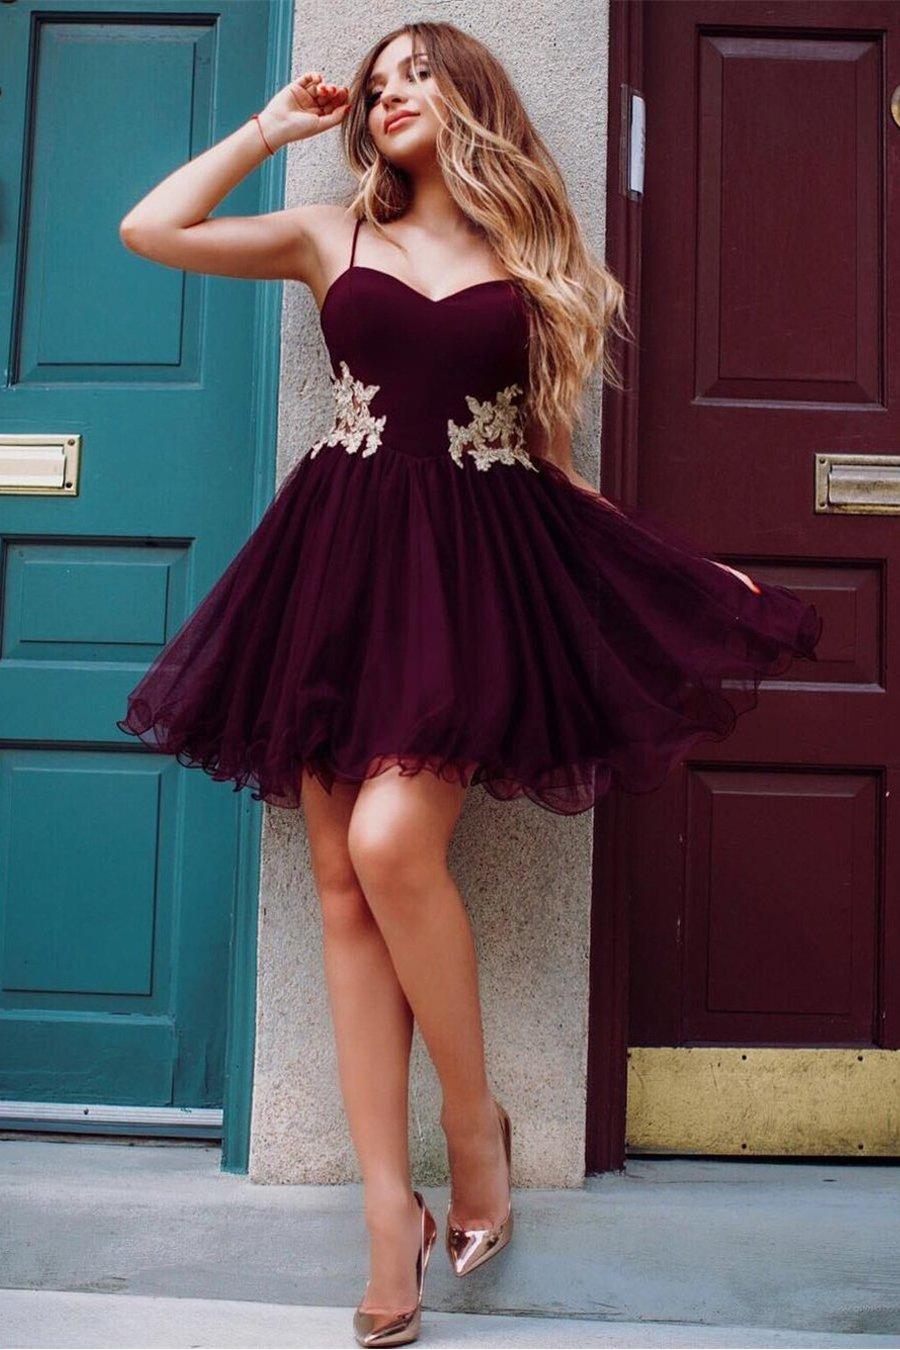 Short prom dress from Angrila.com